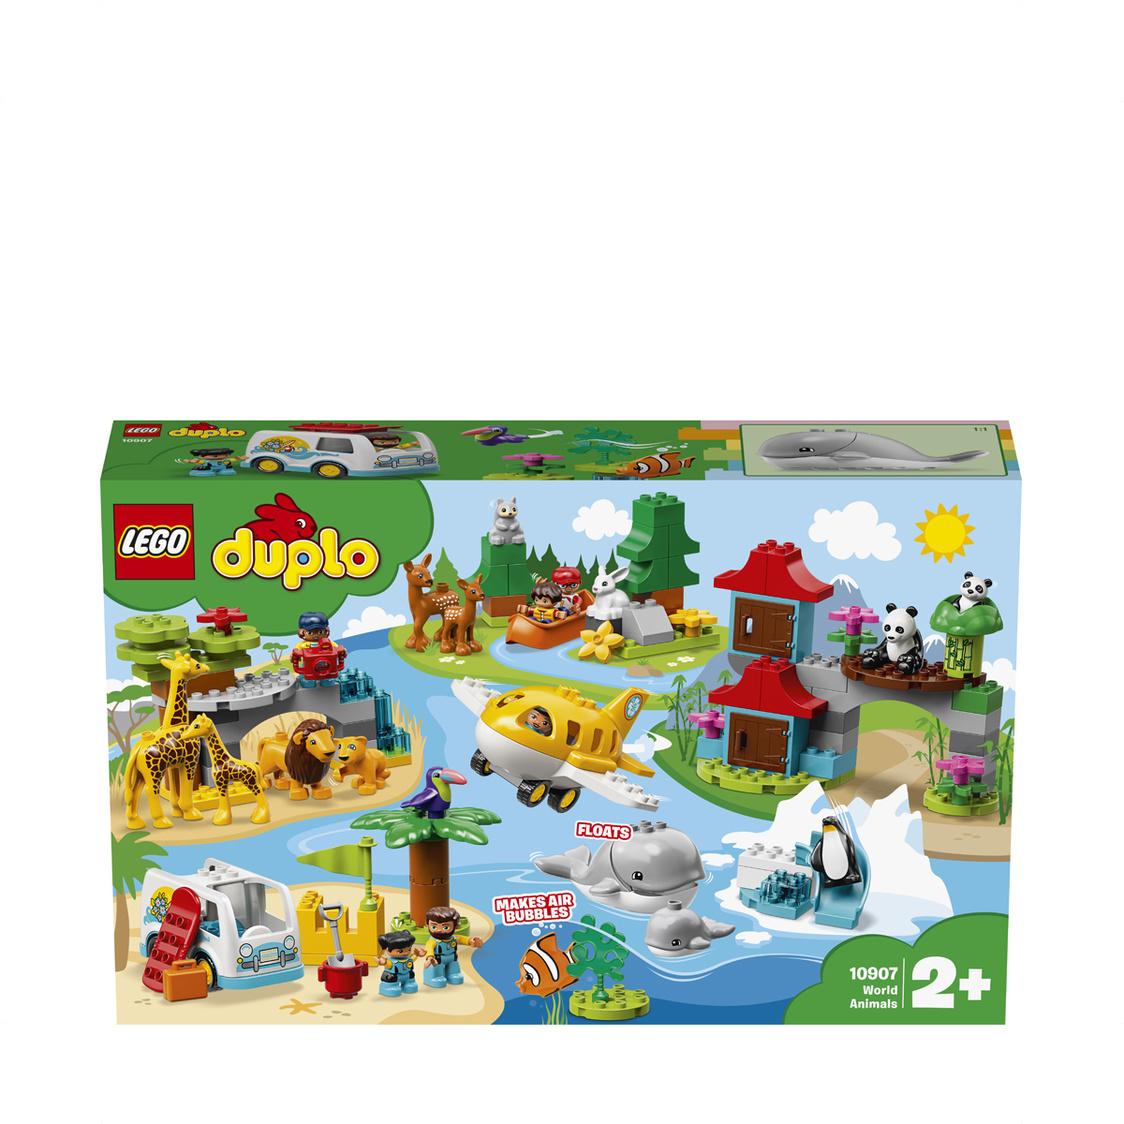 LEGO DUPLO - World Animals 10907